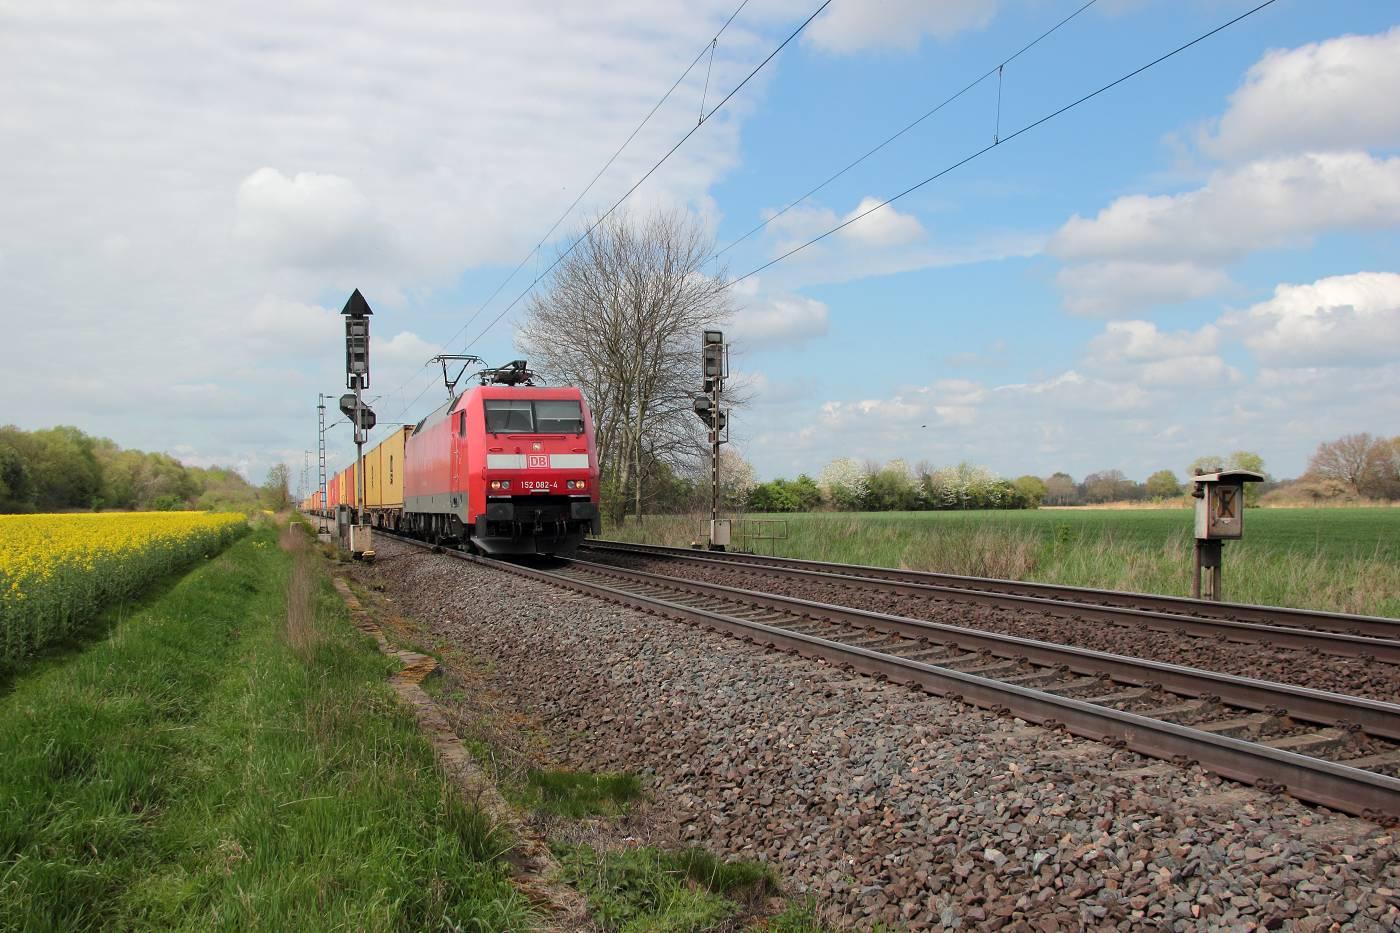 http://www.nachtbahner.de/fotos/2014-04-11%20Hochbetrieb%20in%20HB-Mahndorf/k-IMG_2758%20Mahndorfer%20Raps%20(2).JPG